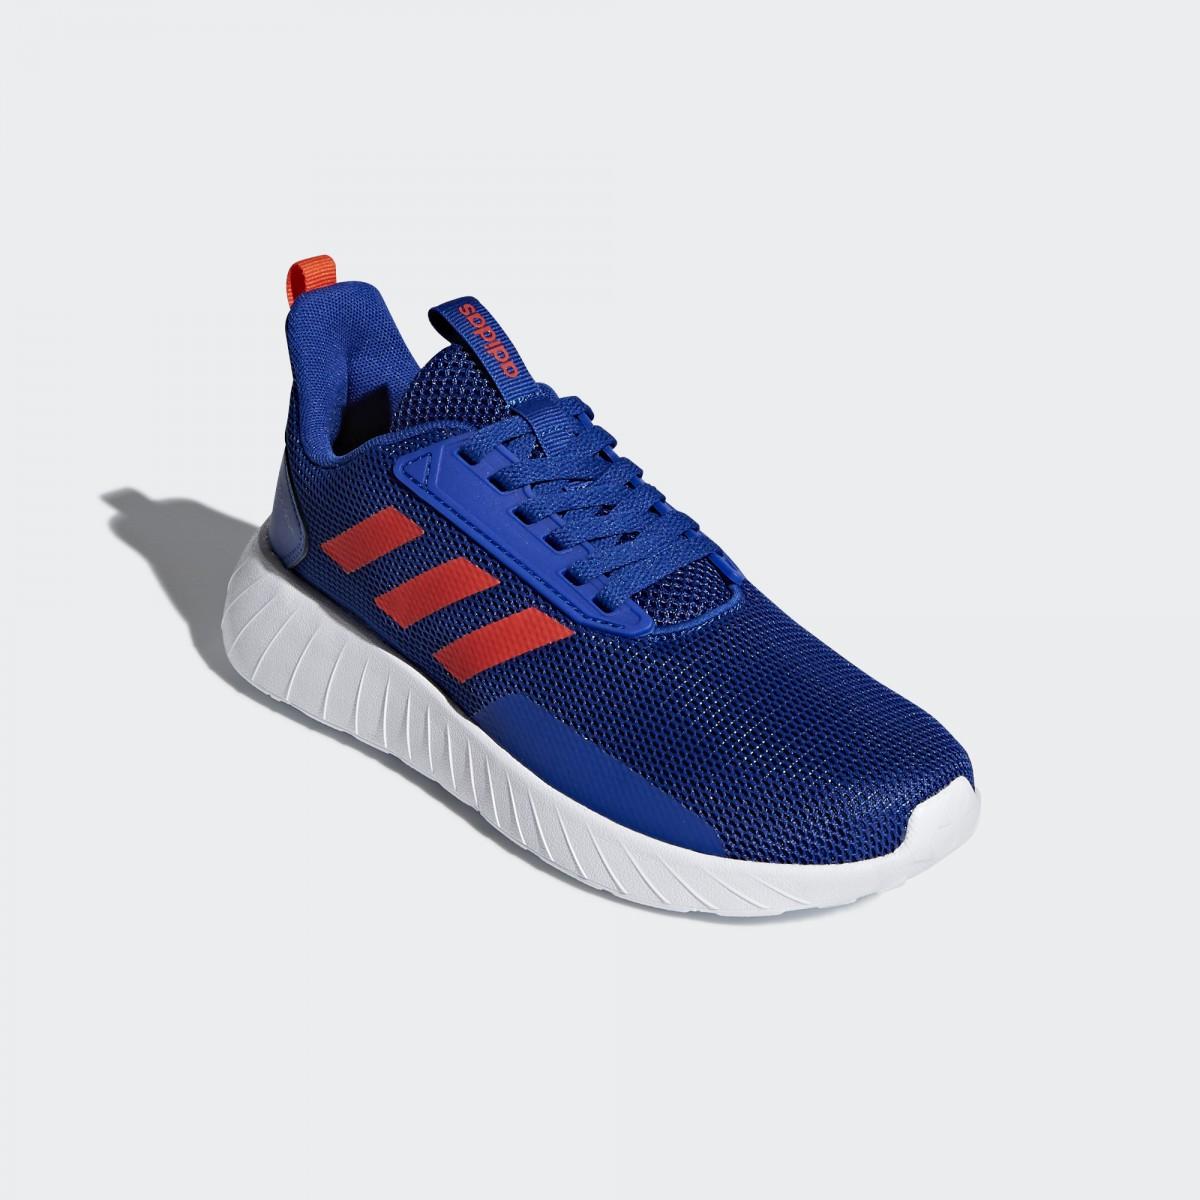 best sneakers 60852 0976b Adidas Scarpe ginnastica tennis sportive Sneakers Questar Drive K Bambino  Blu